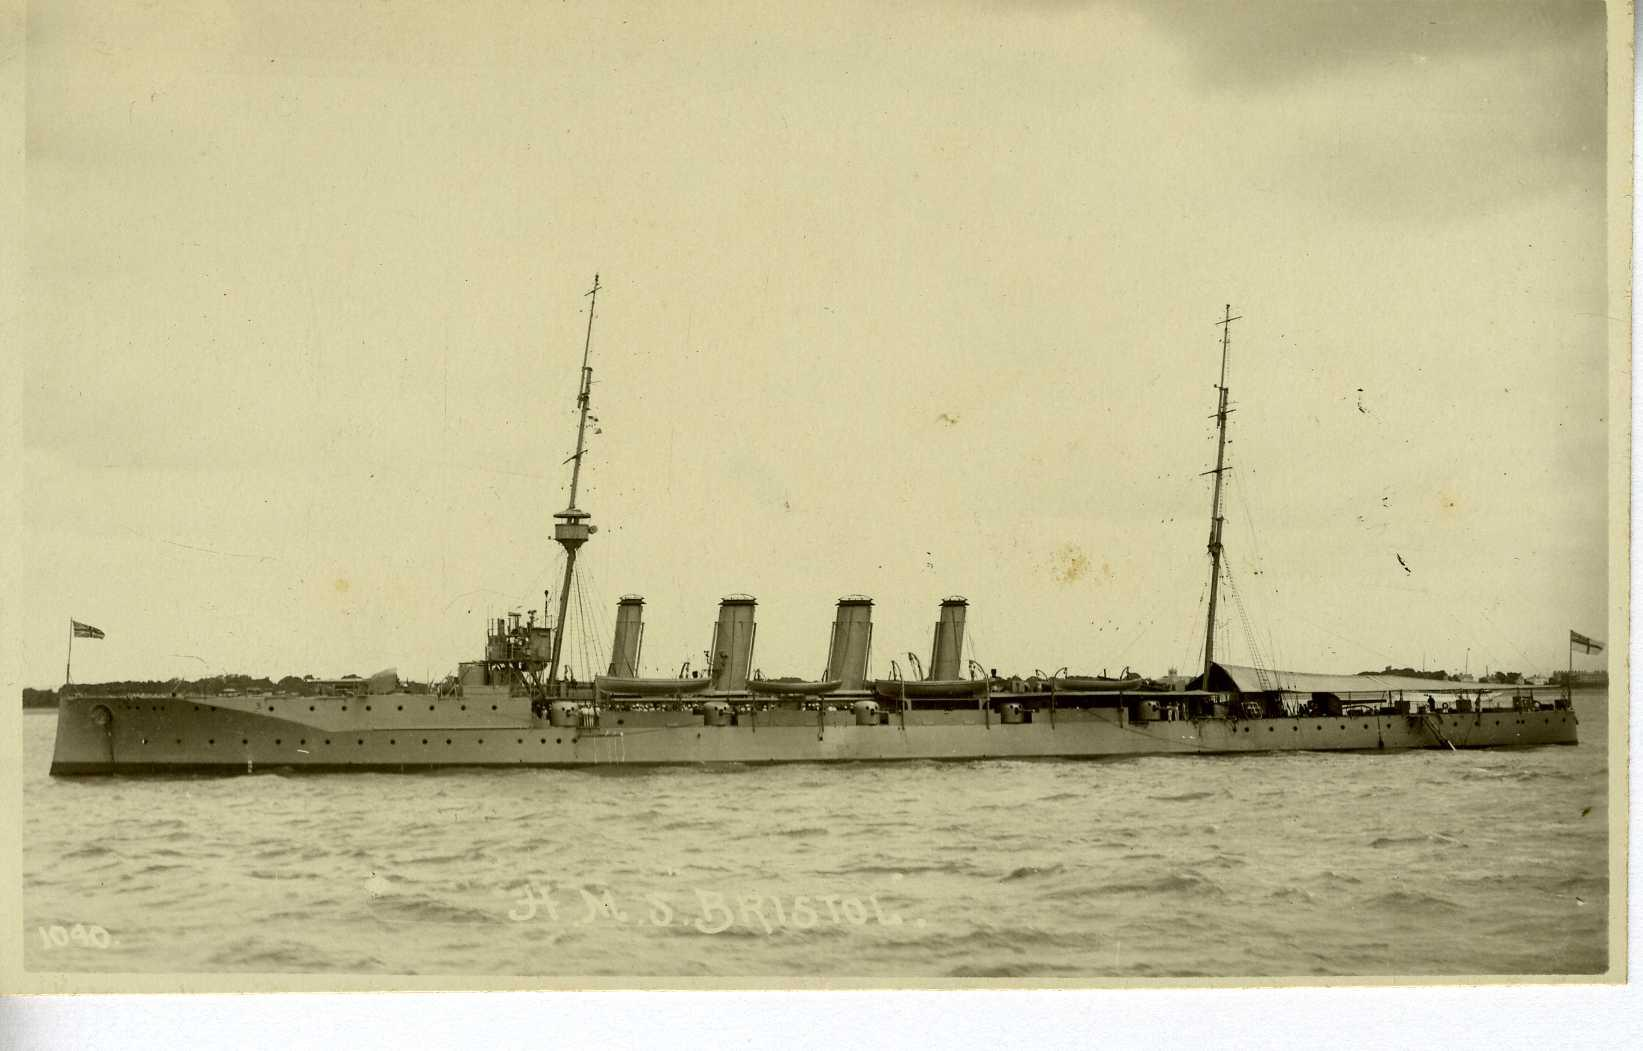 HMS Bristol, light cruiser